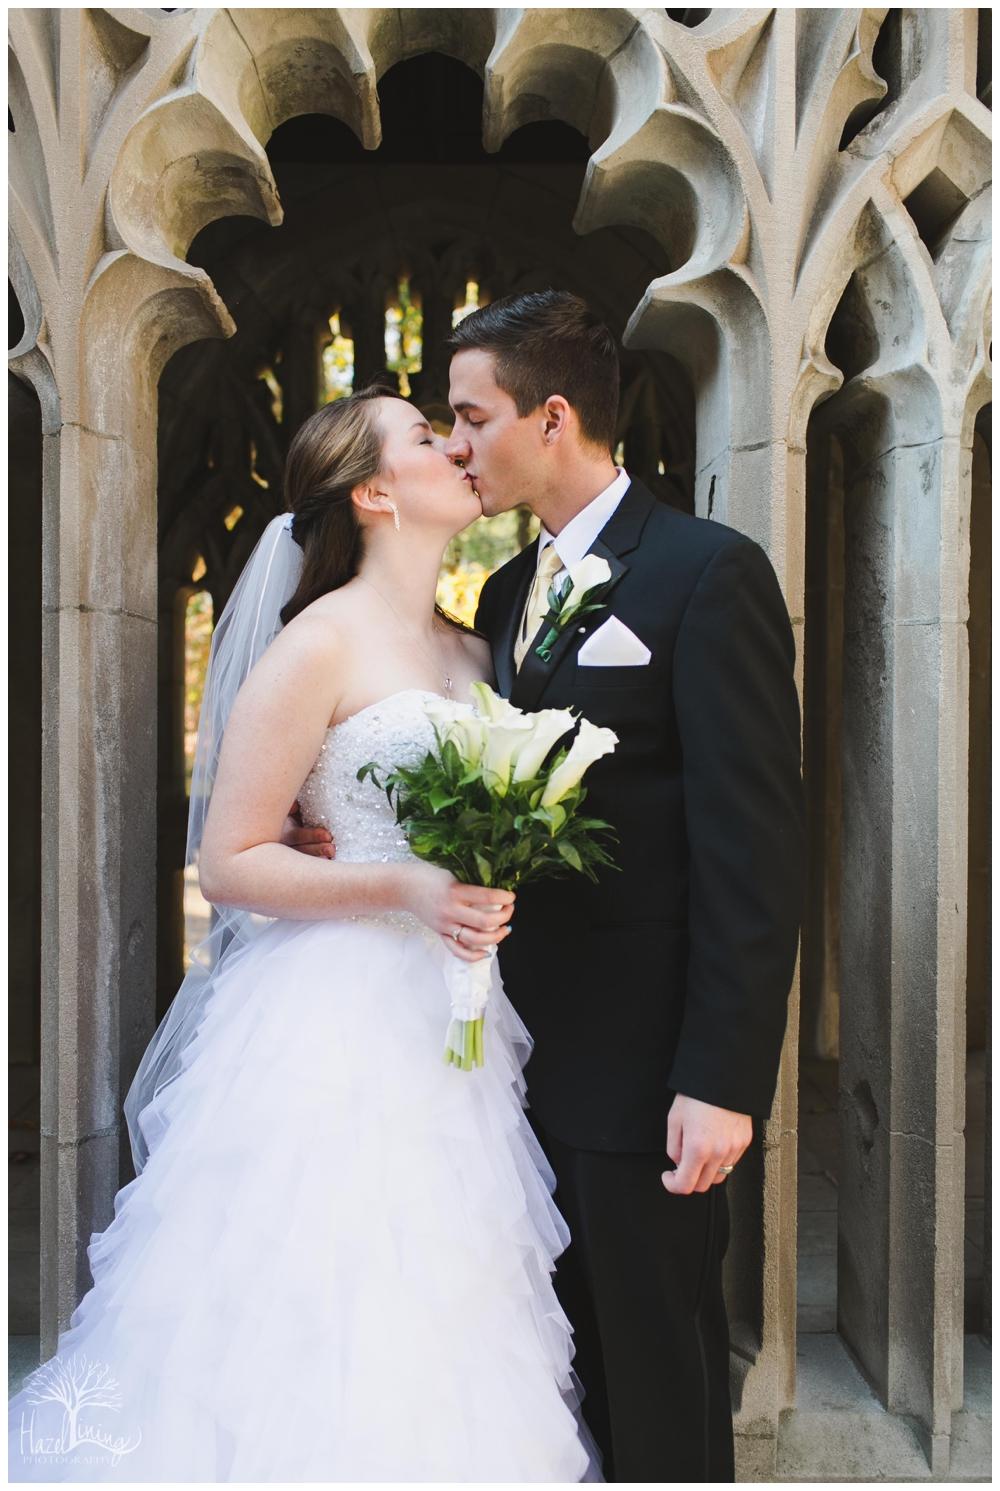 hazel-lining-photography-wedding-portrait-buckscounty-pennsylvania-stephanie-reif_0281.jpg